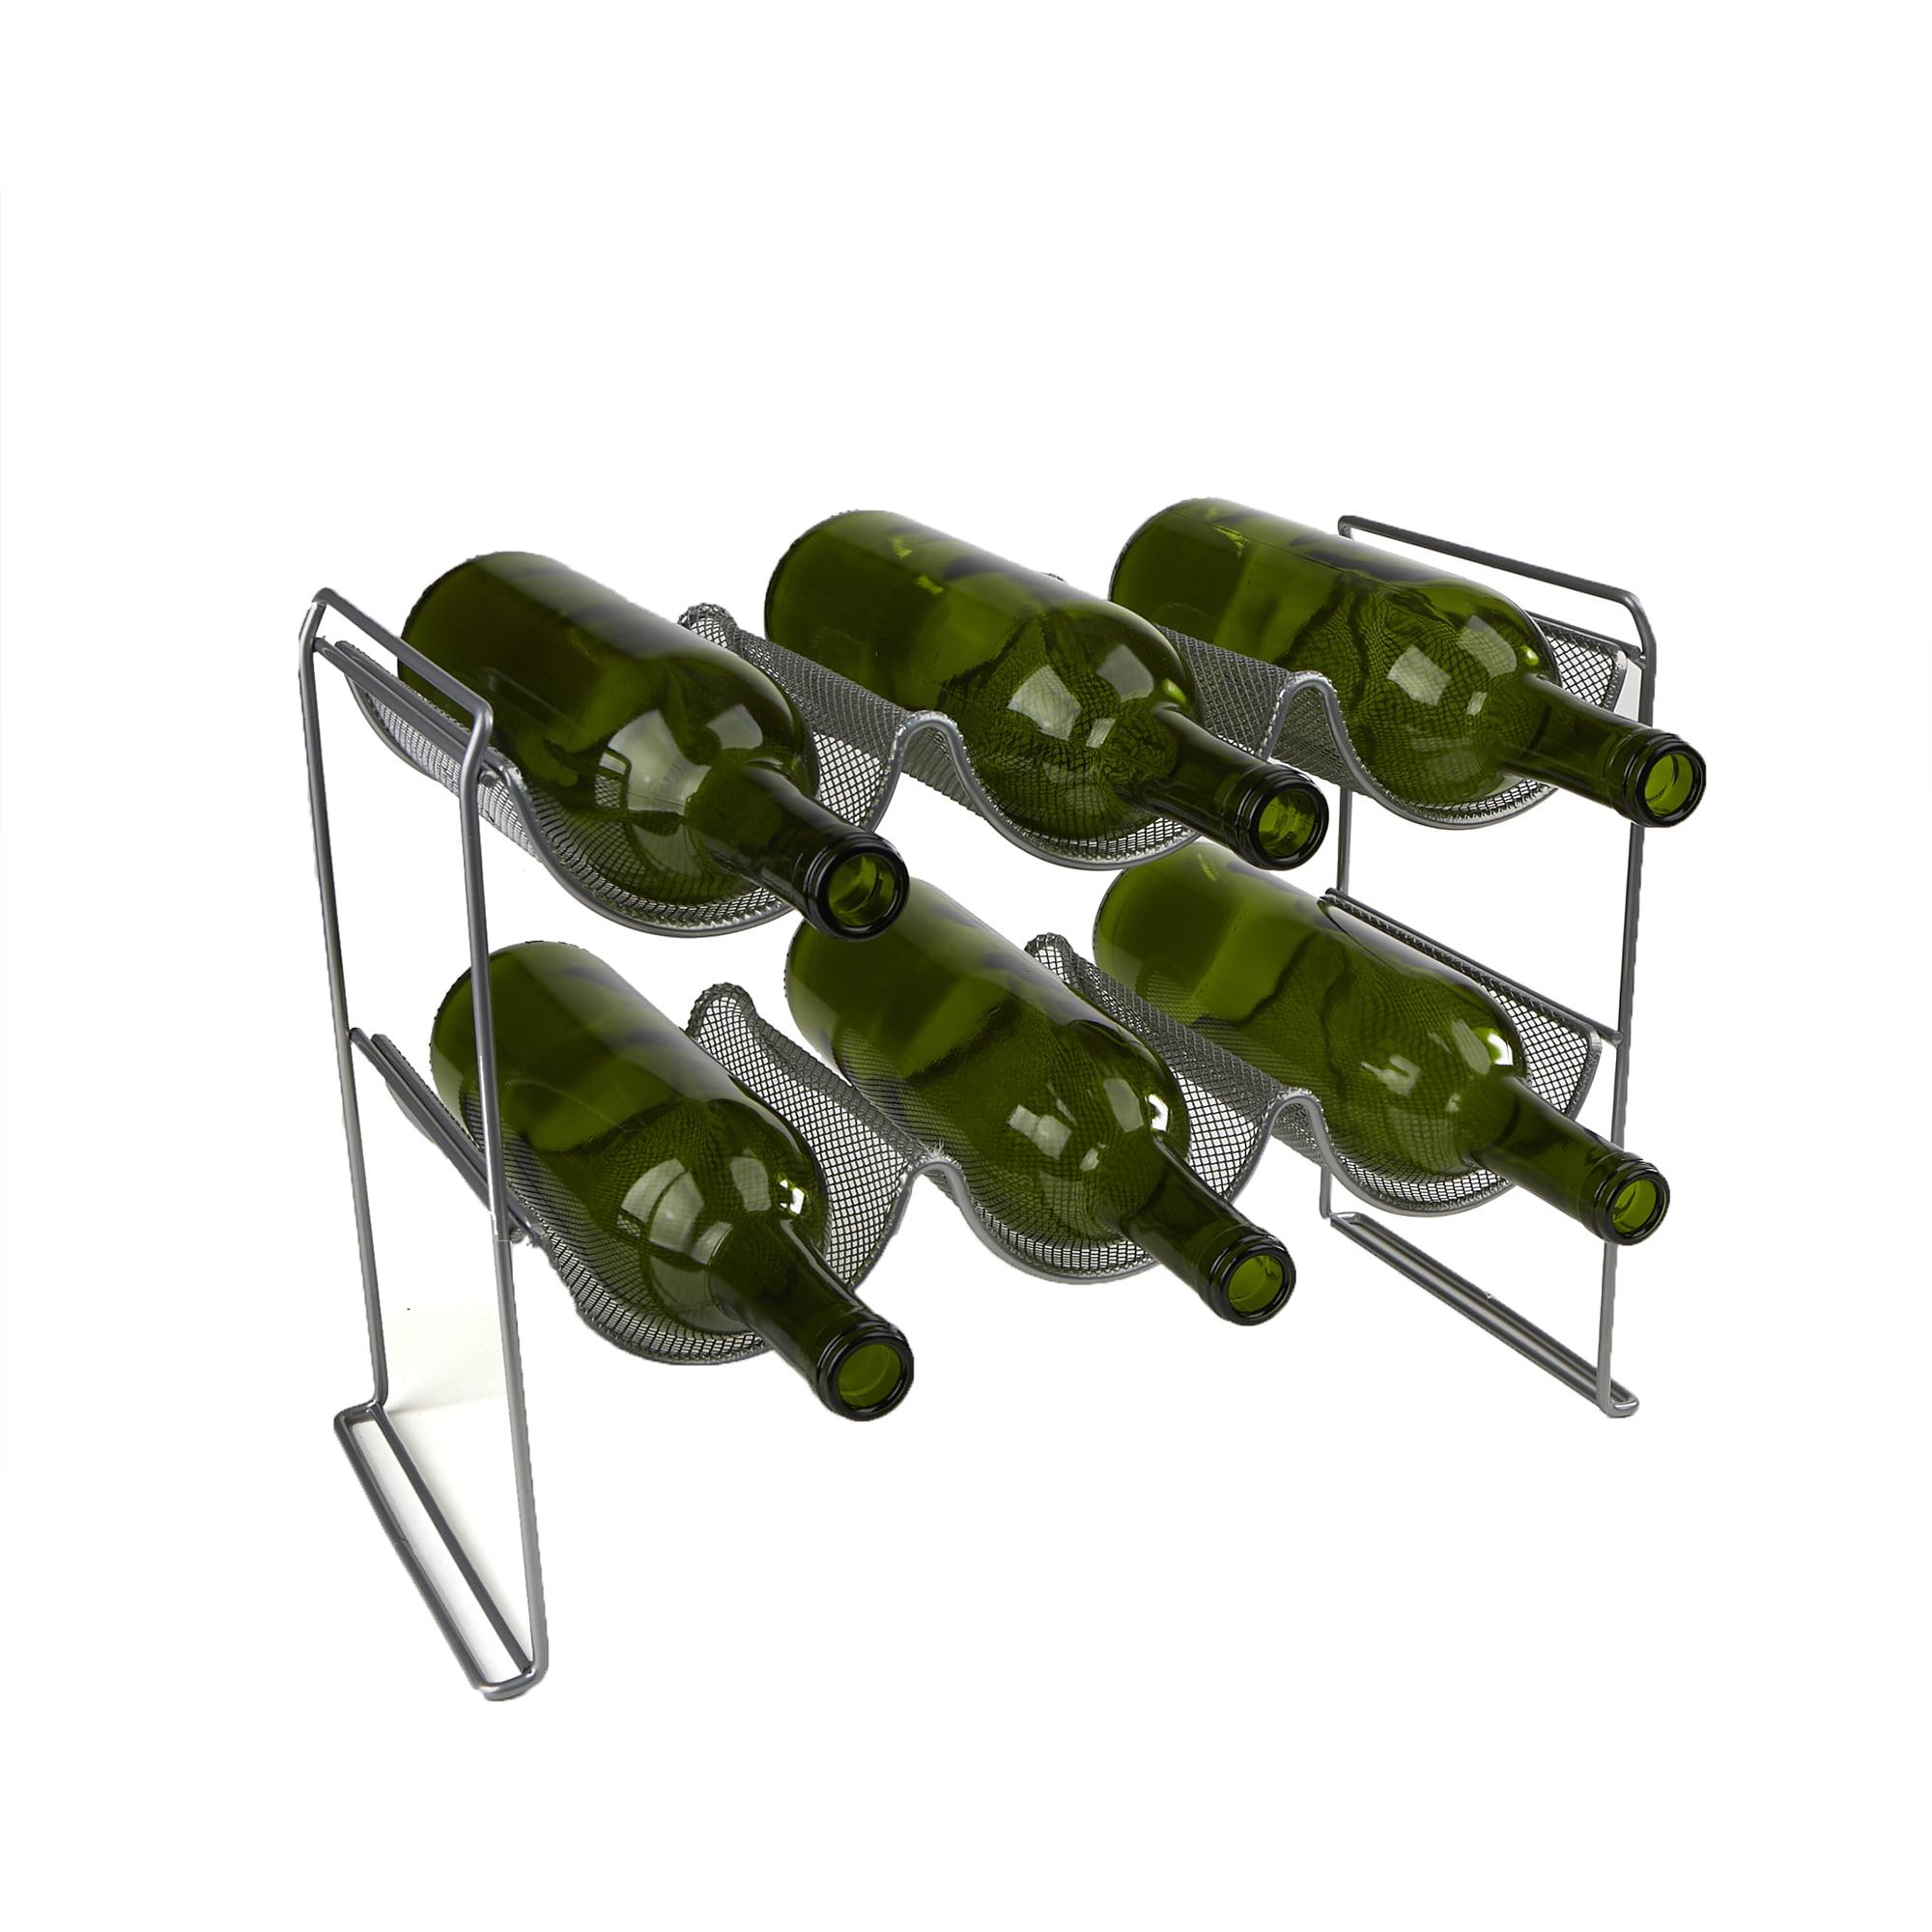 Mind Reader Wine Rack Stand Holds 6 Bottles of Wine, Wine Bottle Holder, Perfect for Bar, Wine Cellar, Counter-top... by EMS Mind Reader LLC